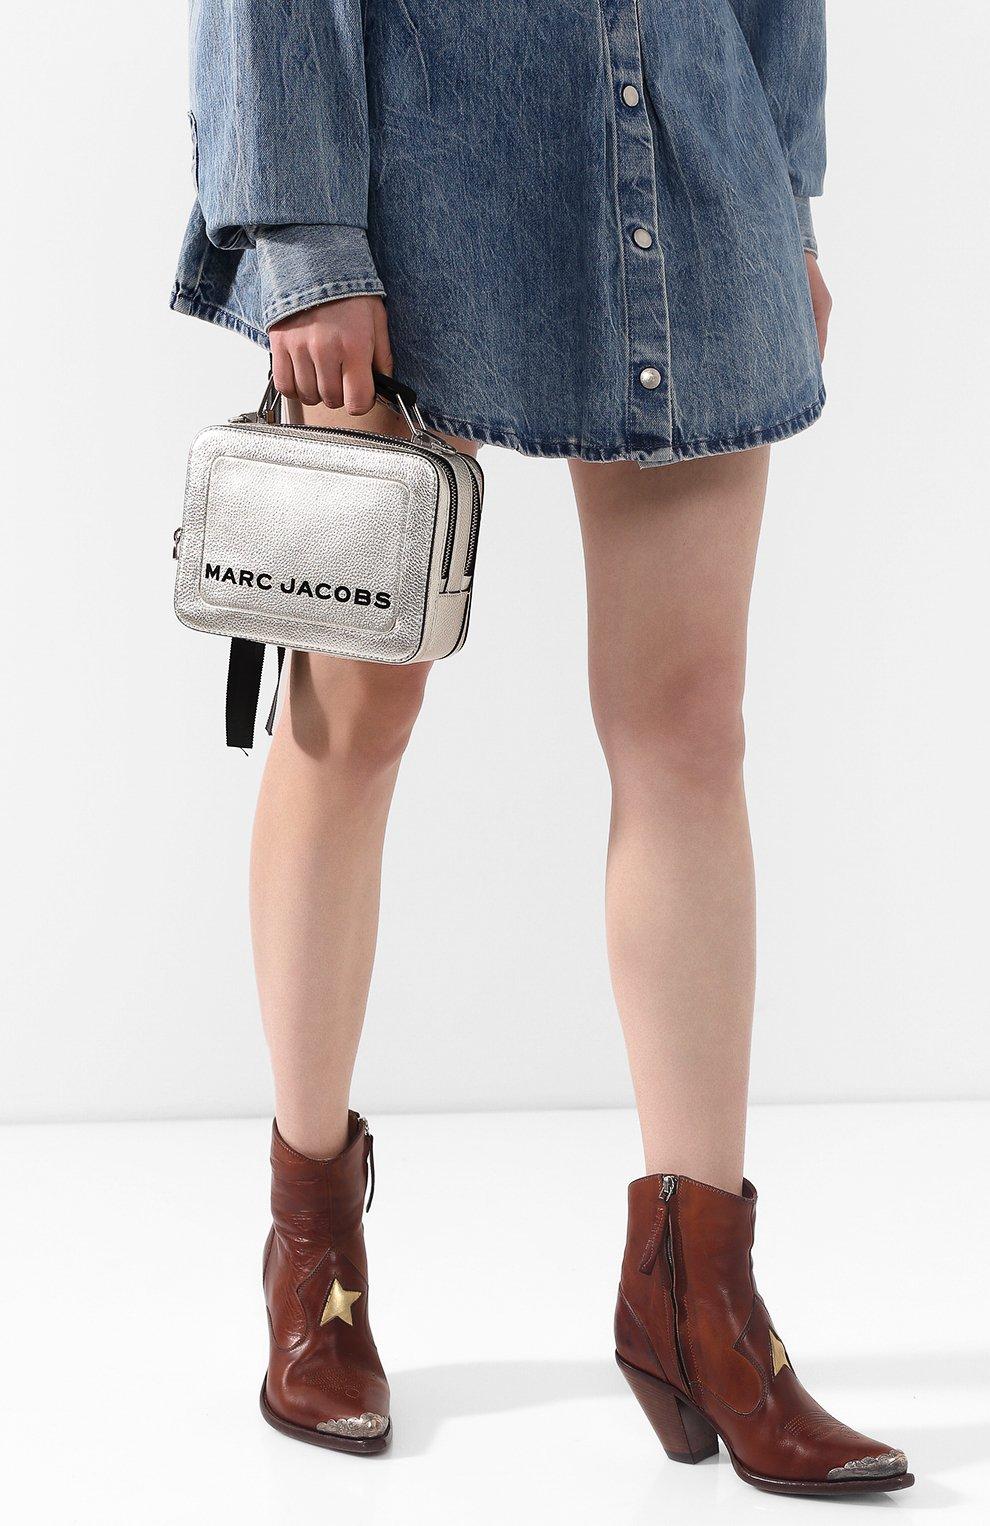 Женская сумка the box 20 MARC JACOBS (THE) серебряного цвета, арт. M0016183 | Фото 2